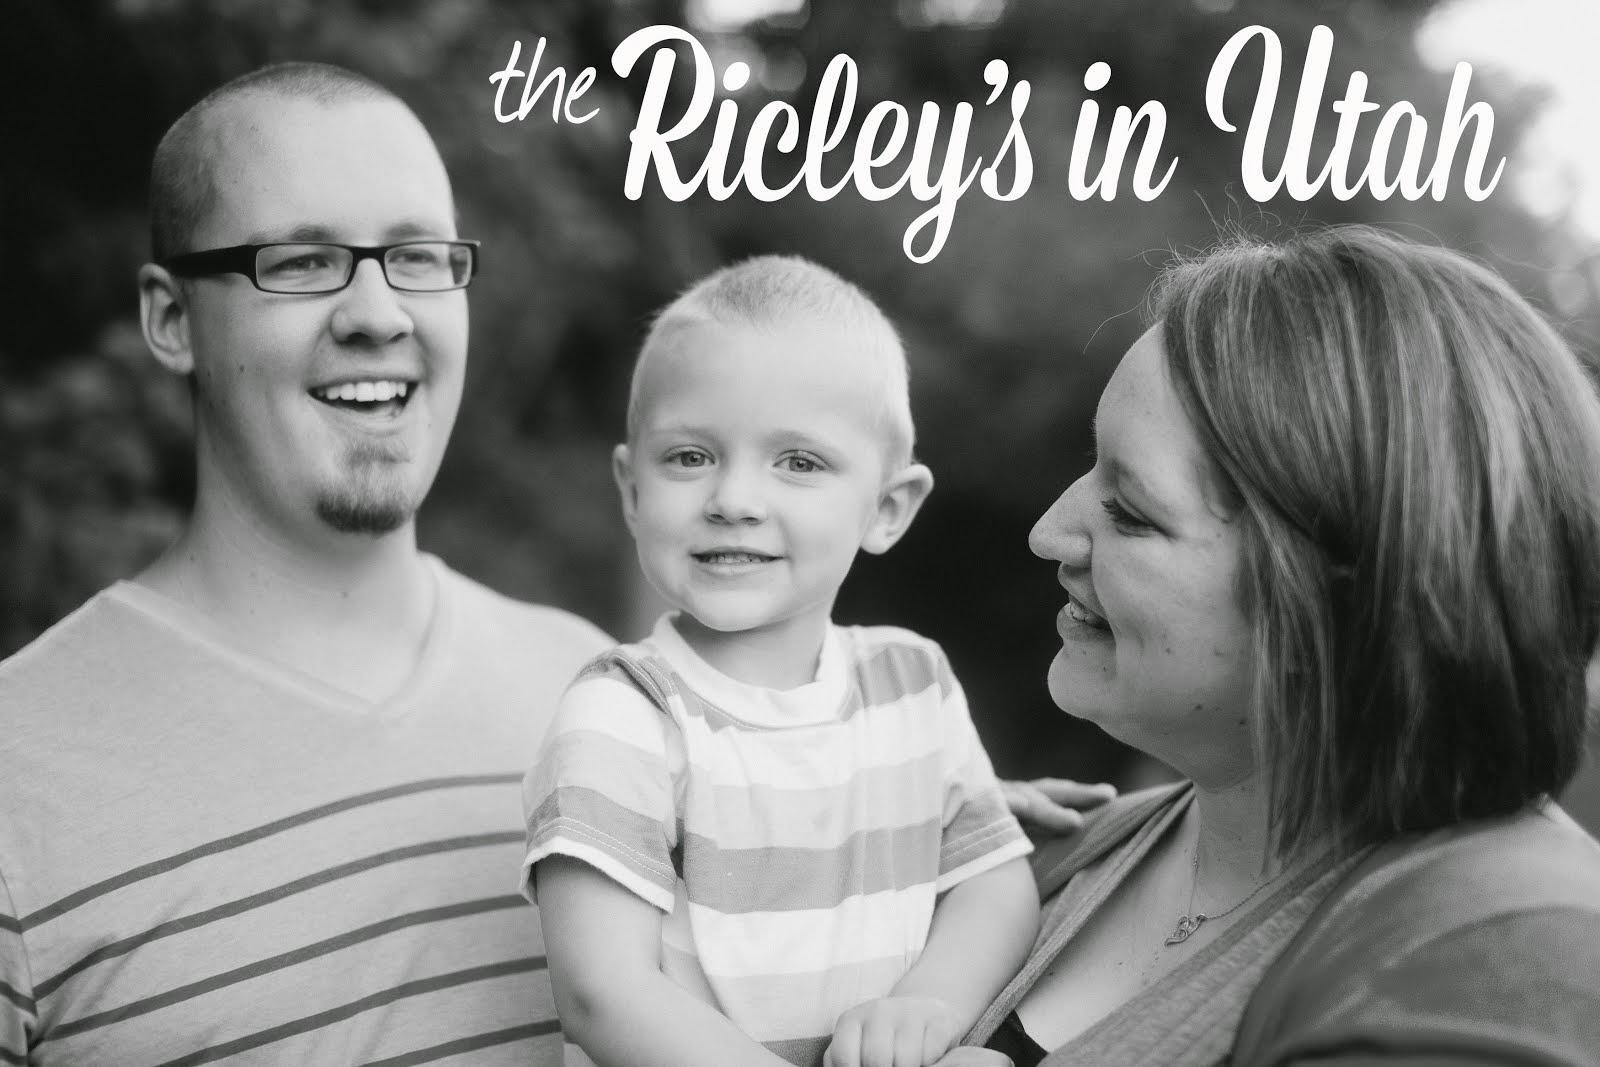 Ricley's in Utah